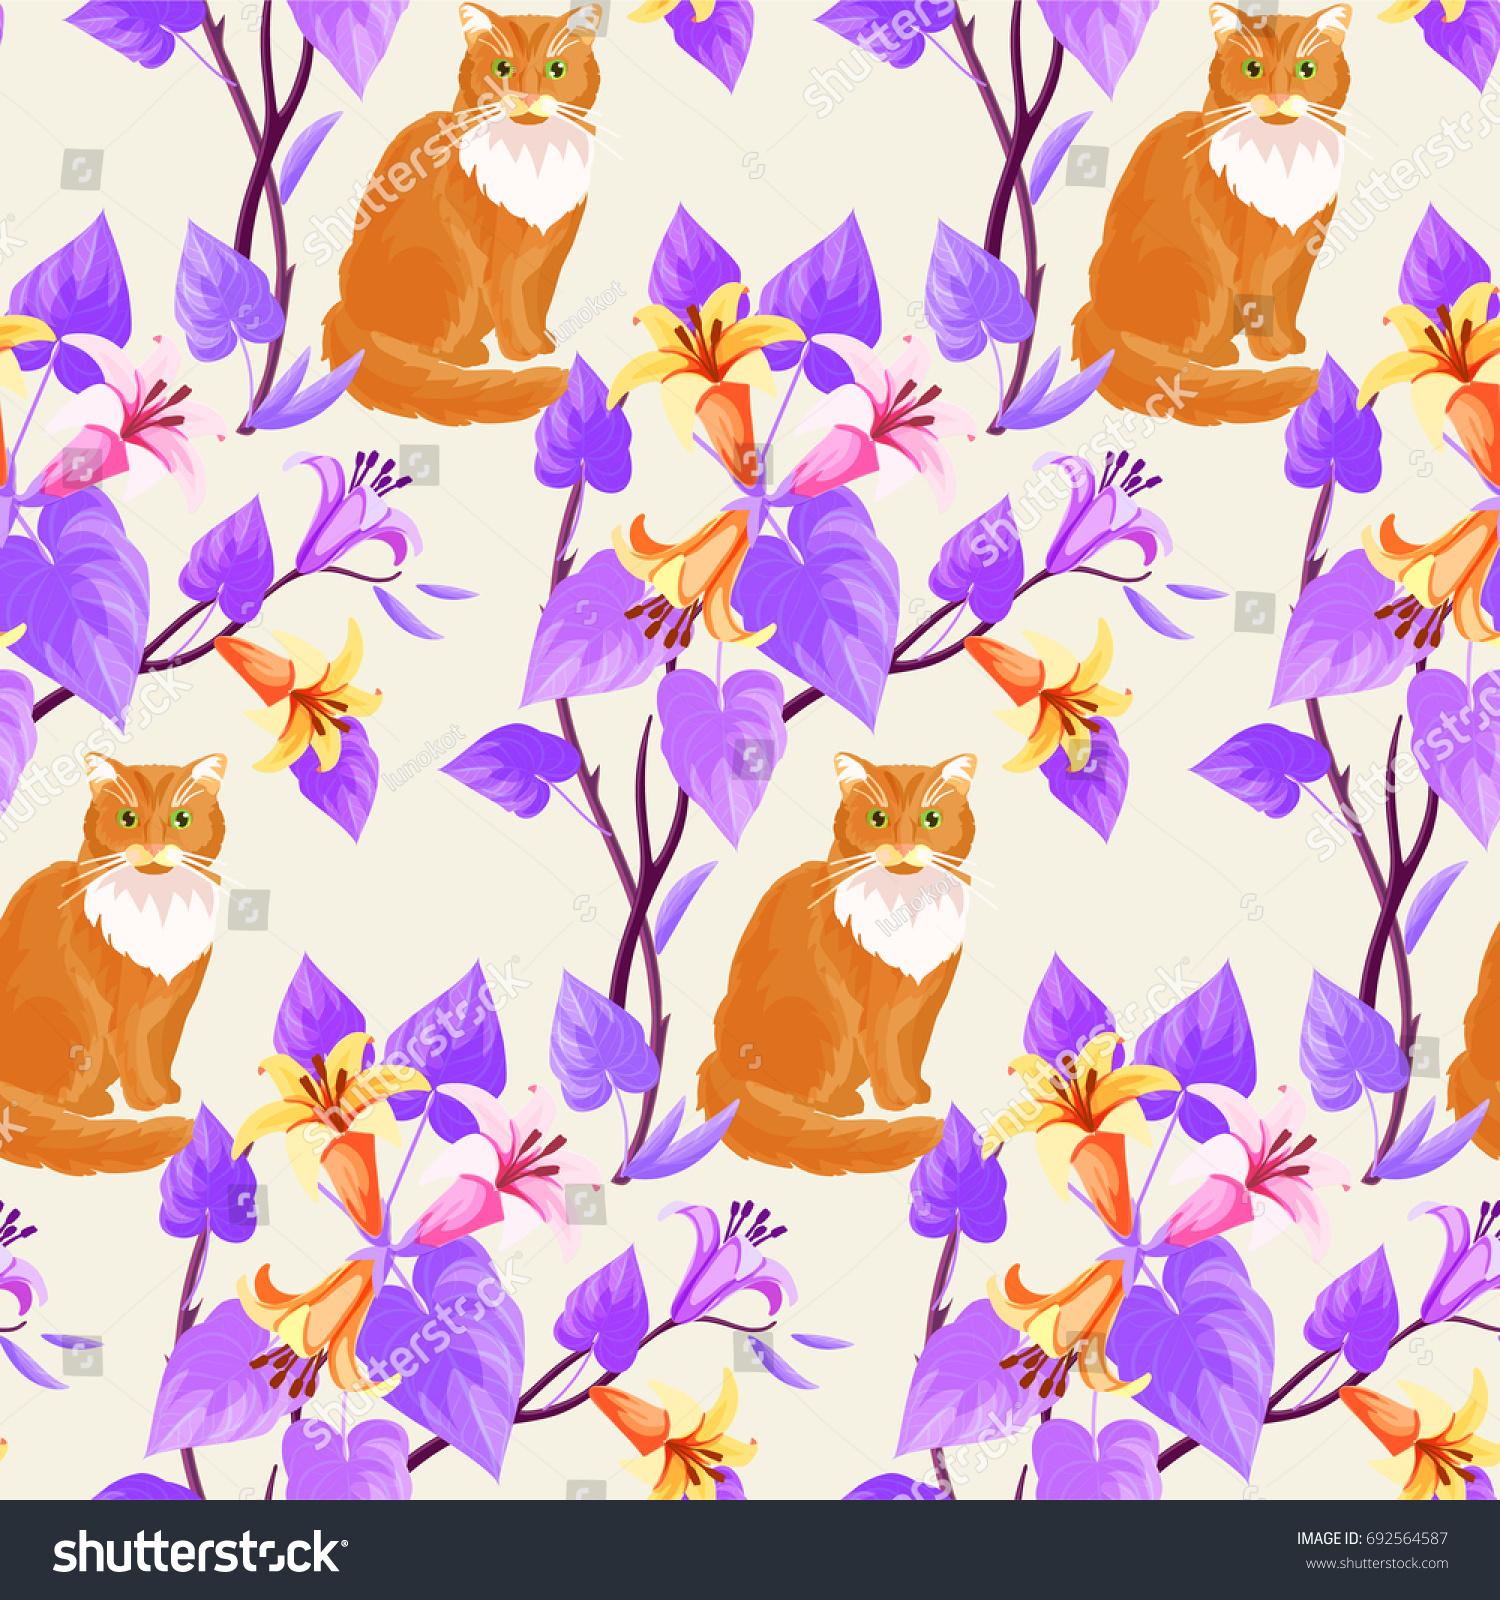 Cats garden flowers lily seamless pattern stock vector 692564587 cats and garden flowers of lily seamless pattern izmirmasajfo